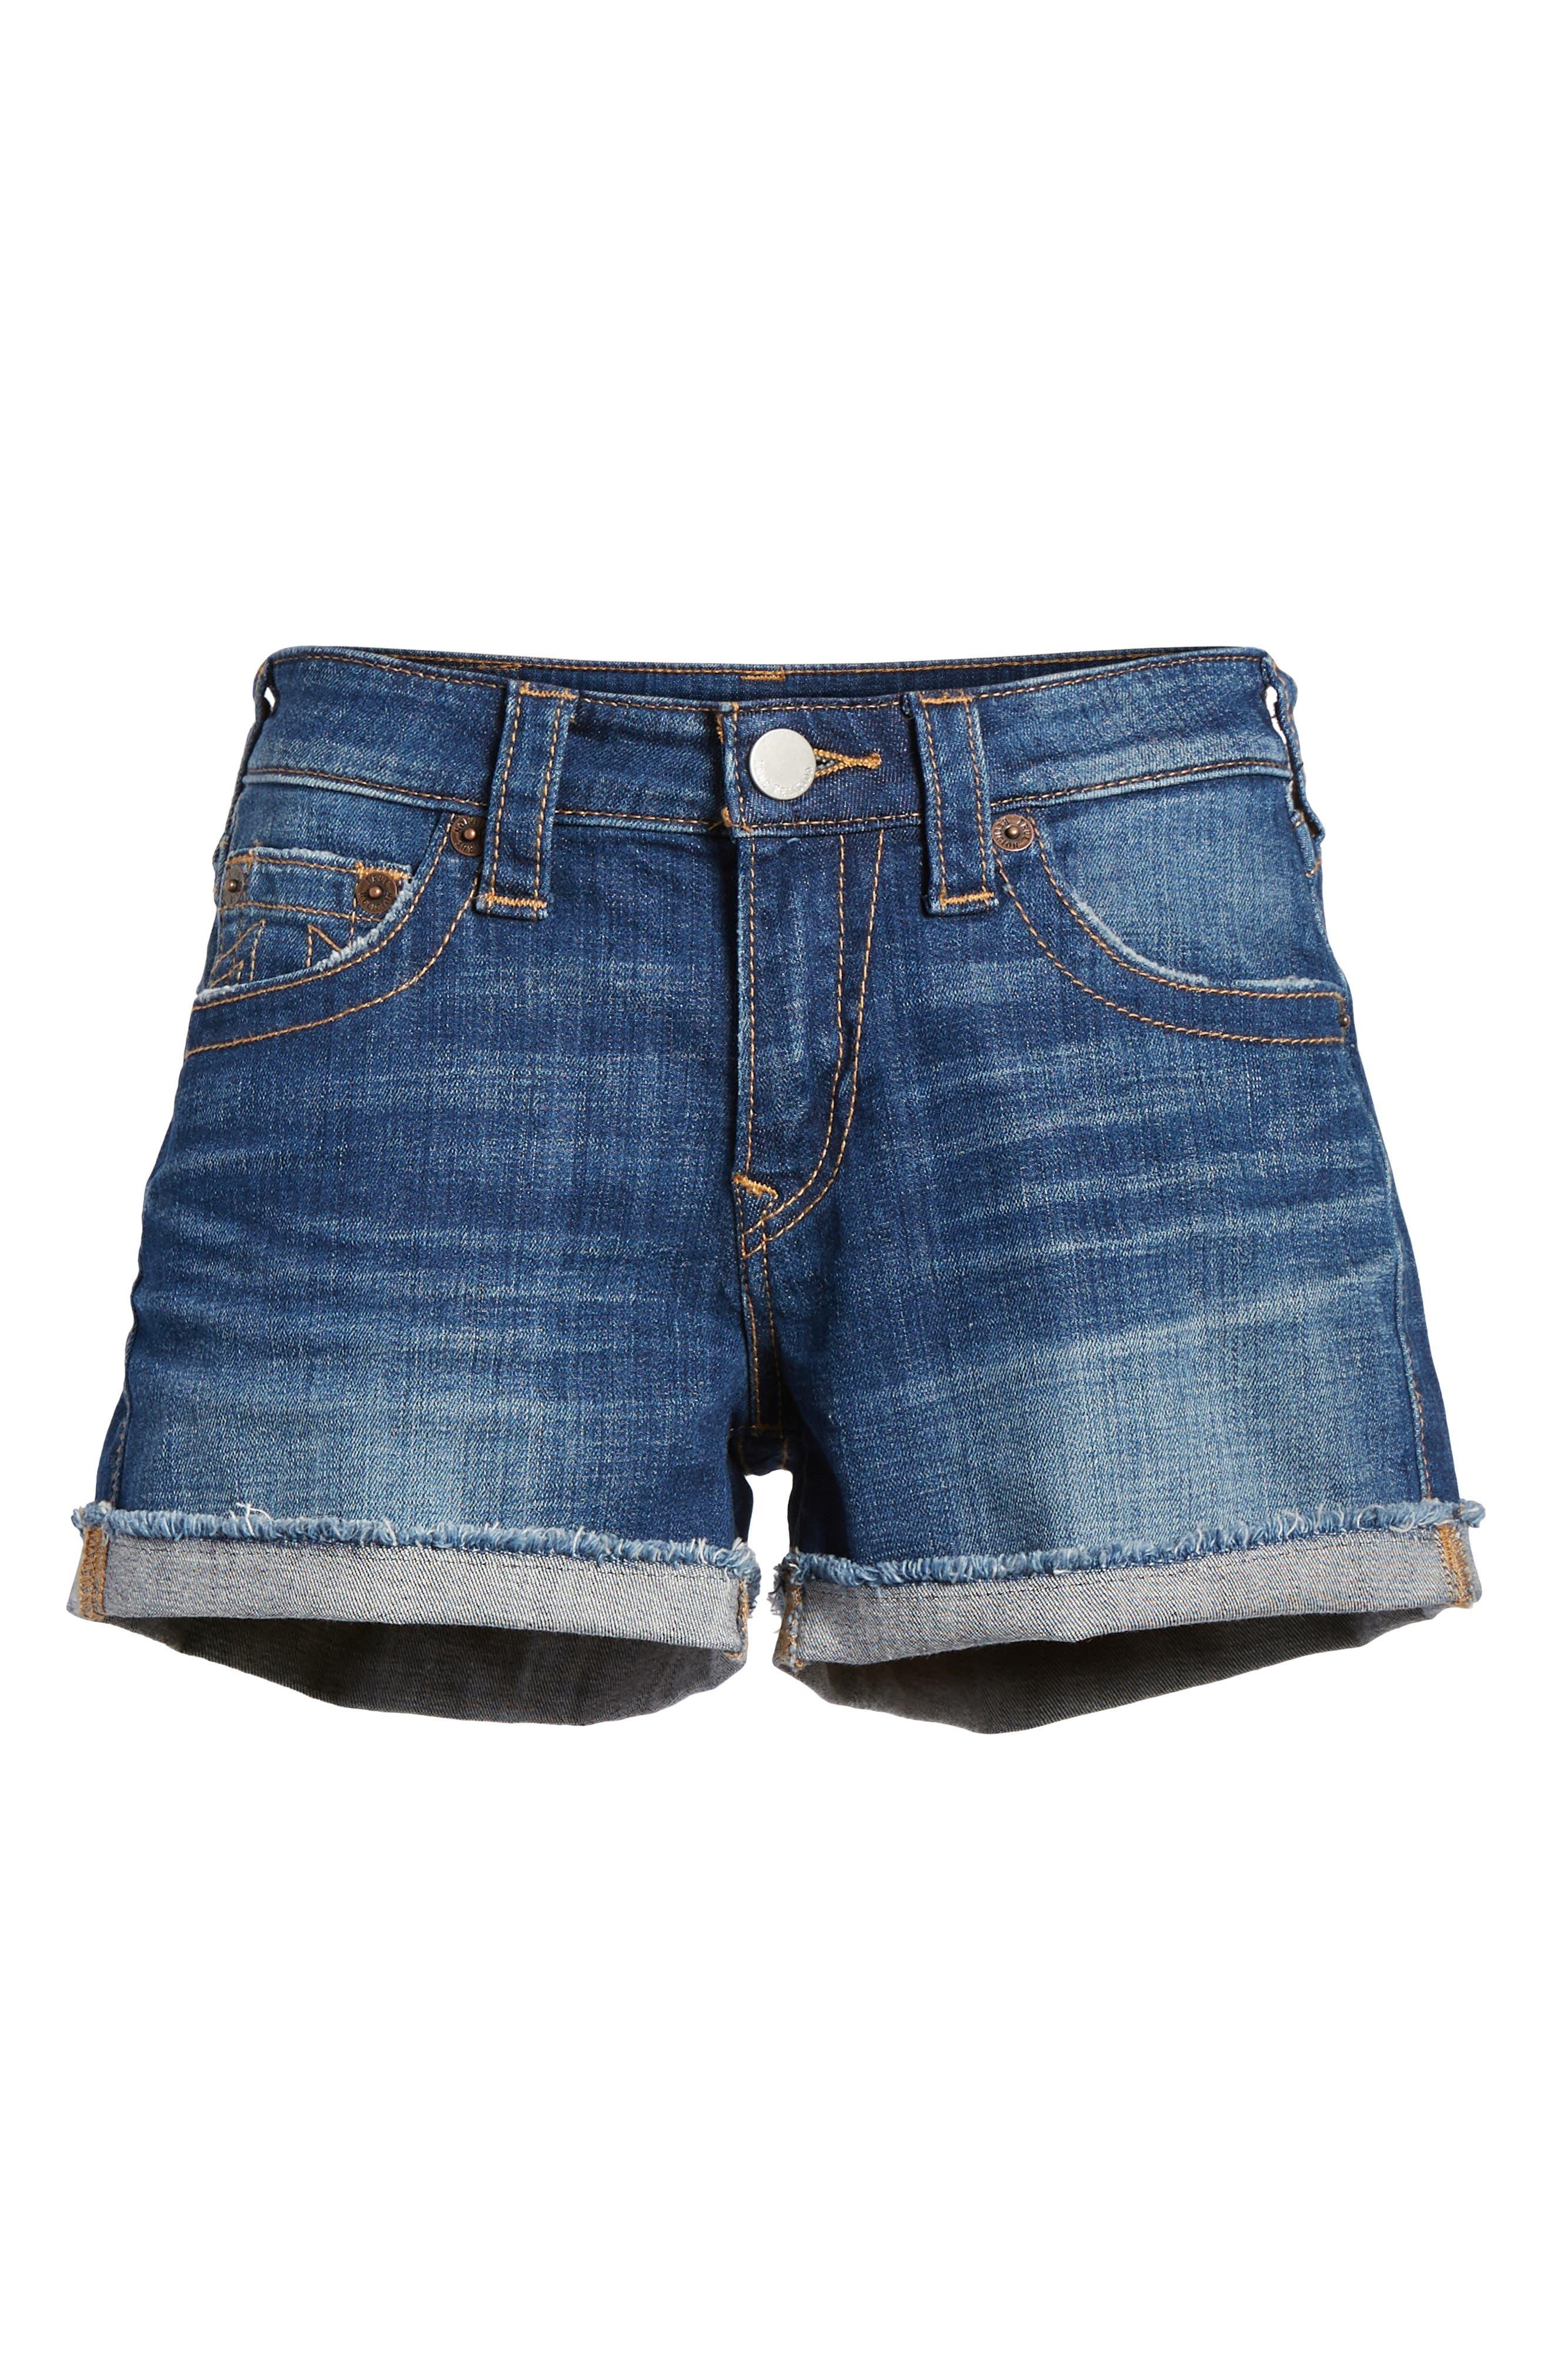 Jennie Curvy Denim Shorts,                             Alternate thumbnail 7, color,                             402